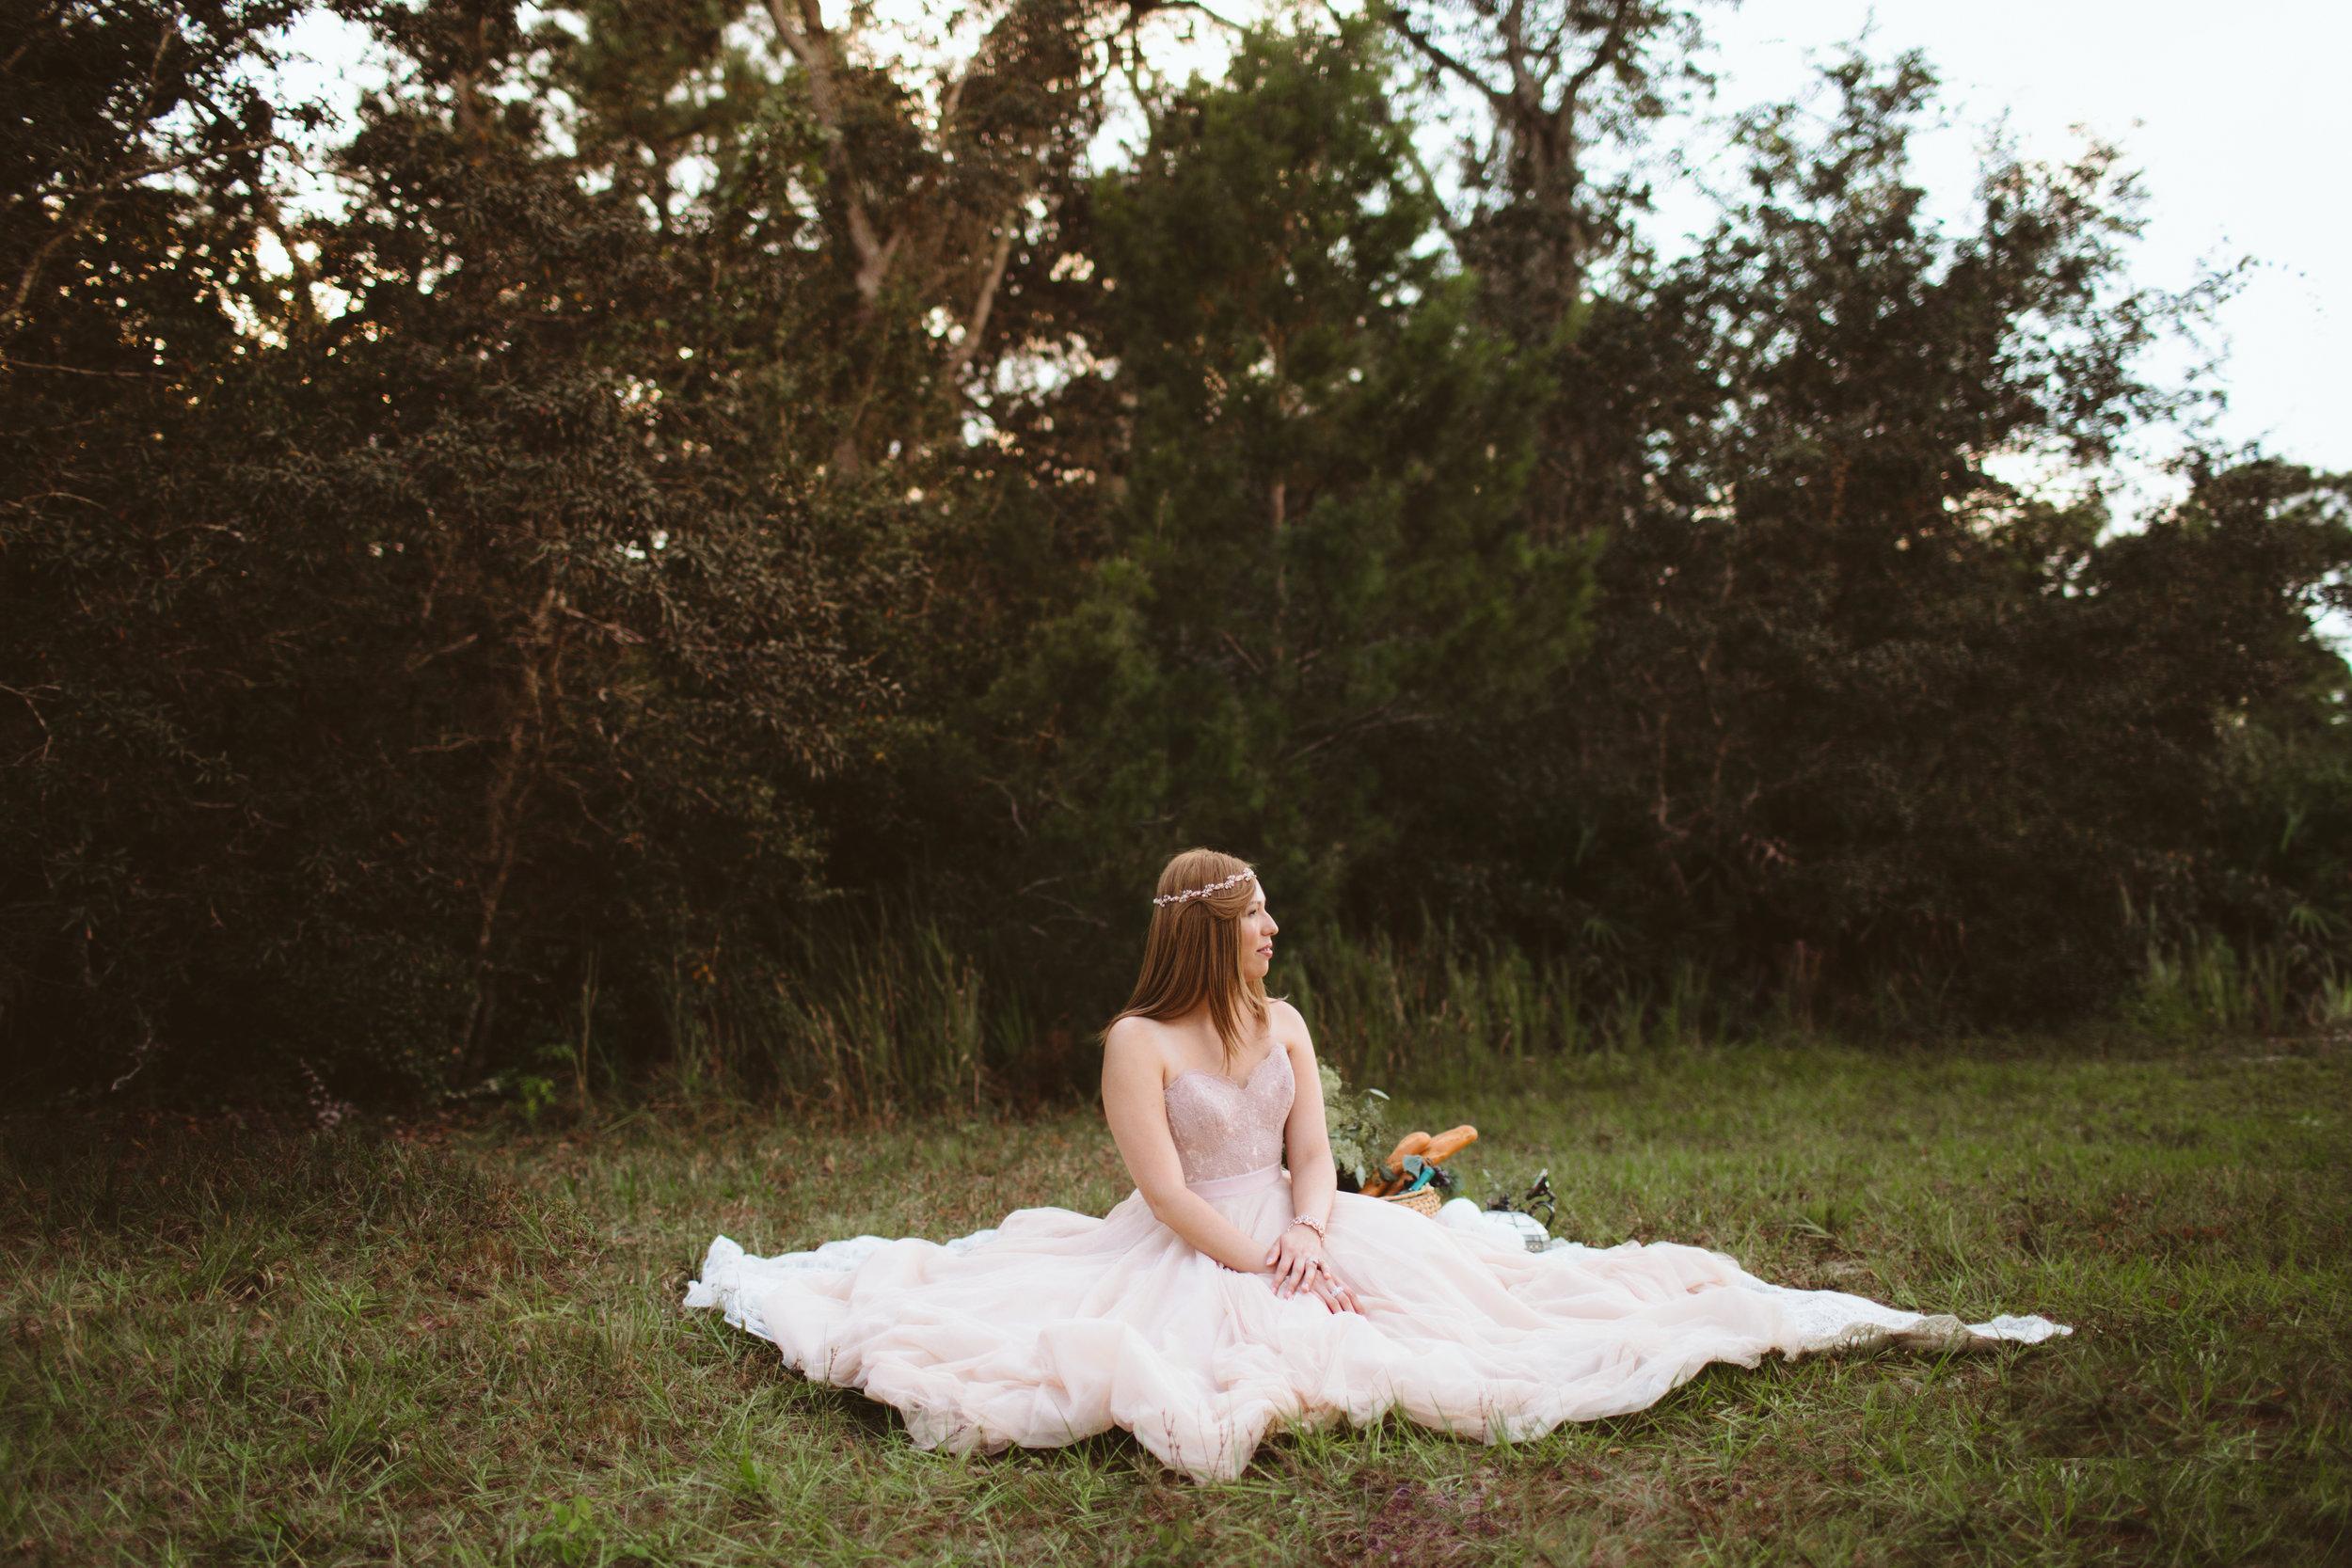 Breast Cancer awareness | Solutions bridal | Waterswoo | Vanessa Boy | vanessaboy.com |-409.com |final.jpg